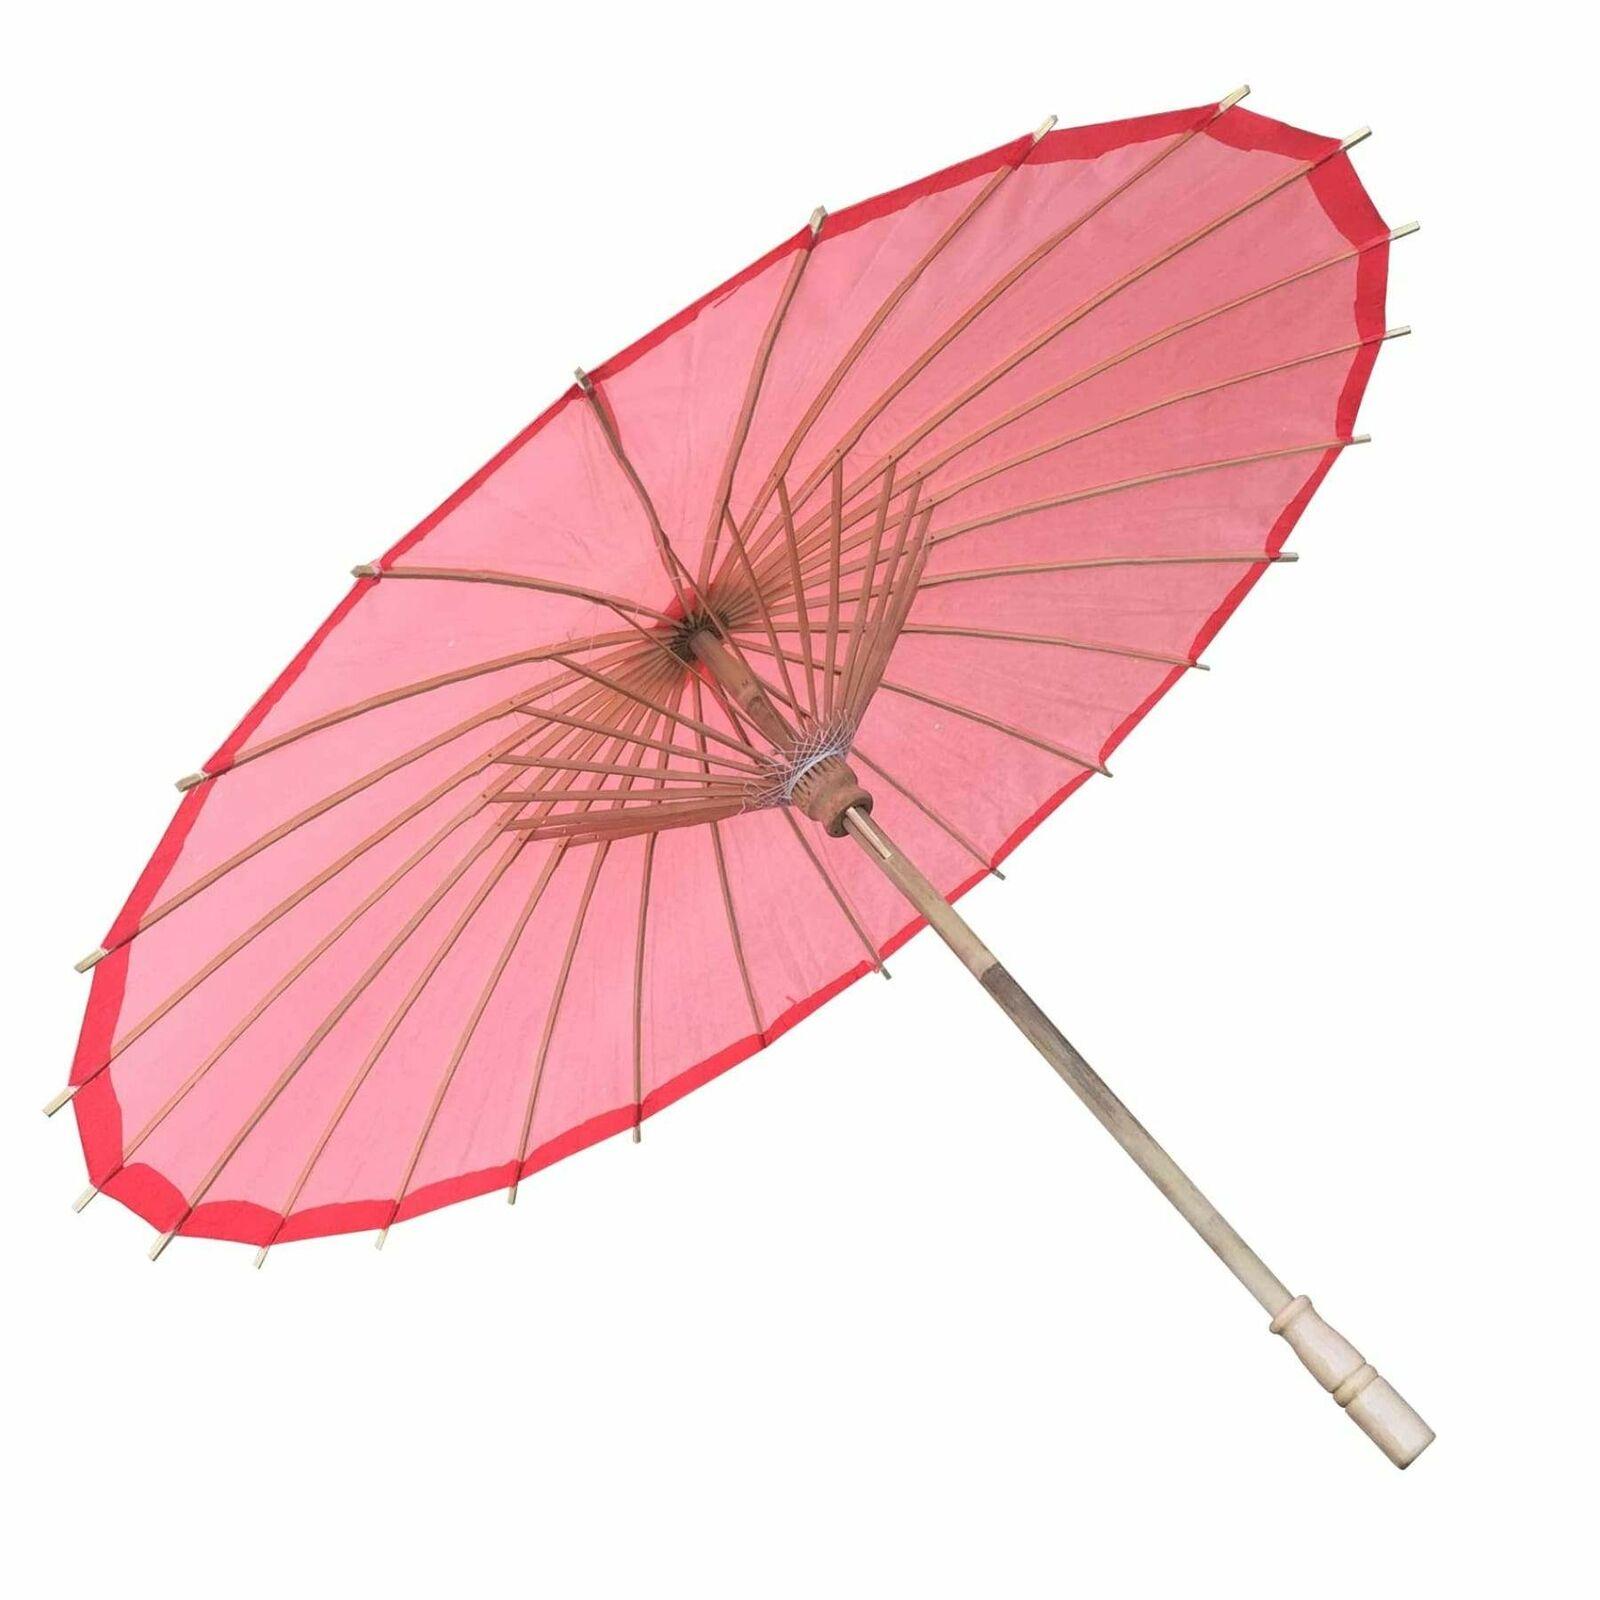 Willow Tree Bamboo Paper Parasol 84 cm Red Umbrella